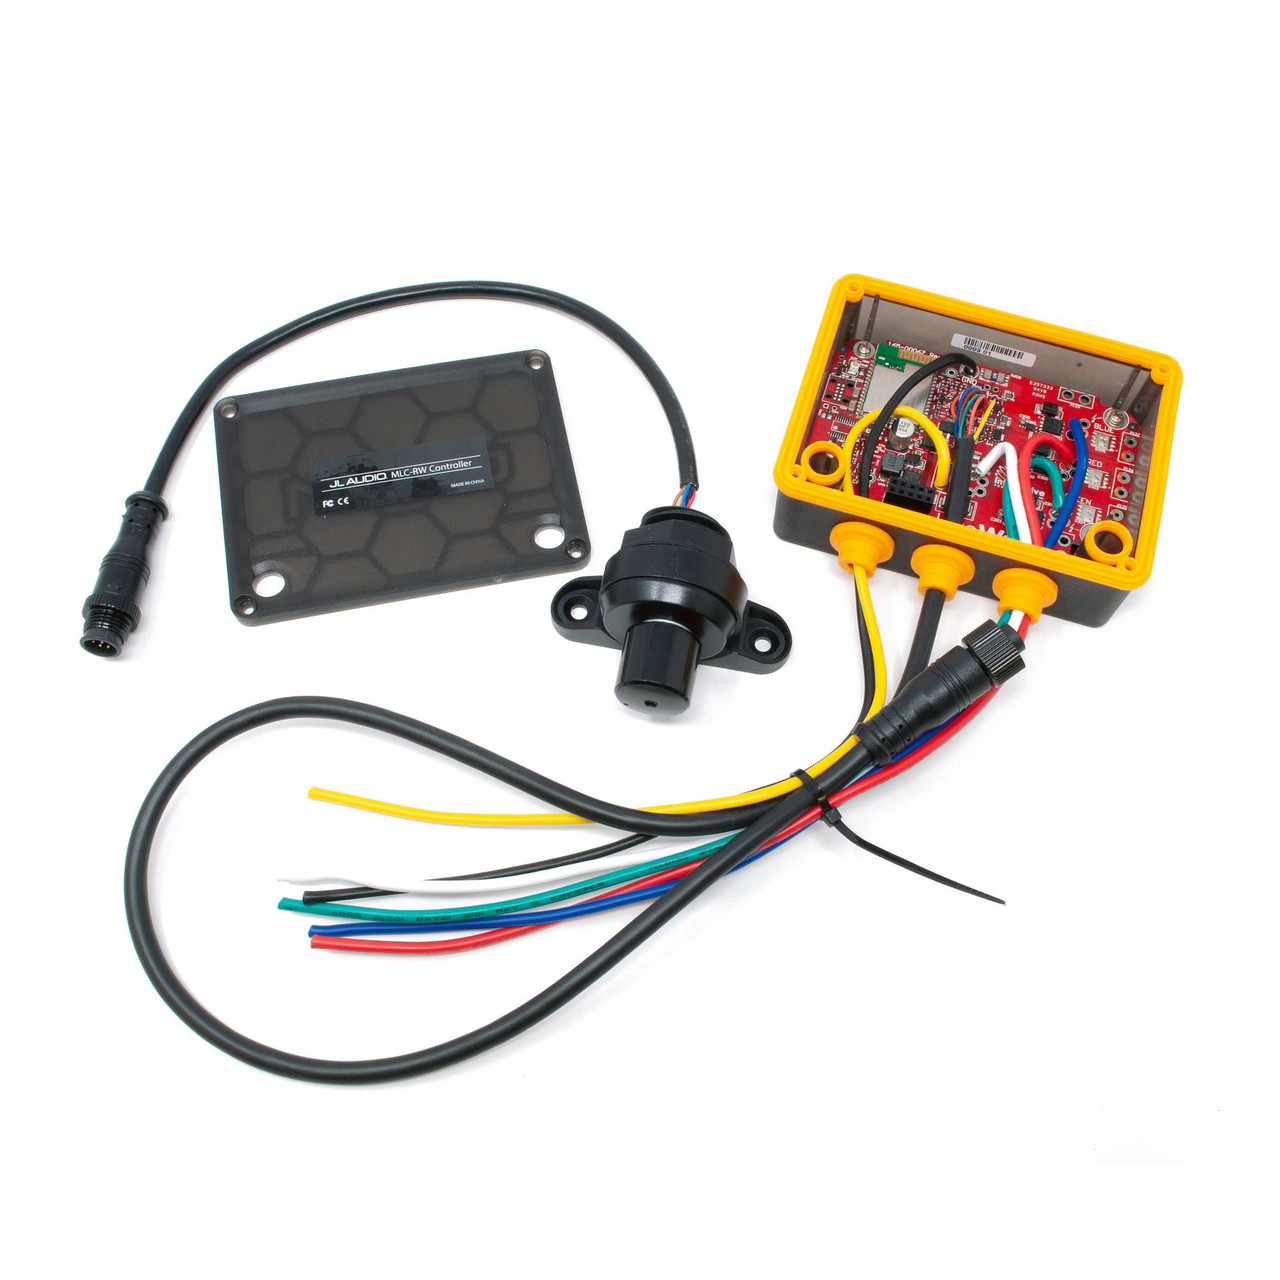 hight resolution of  jl audio mlc rw marine led lighting controller with wifi